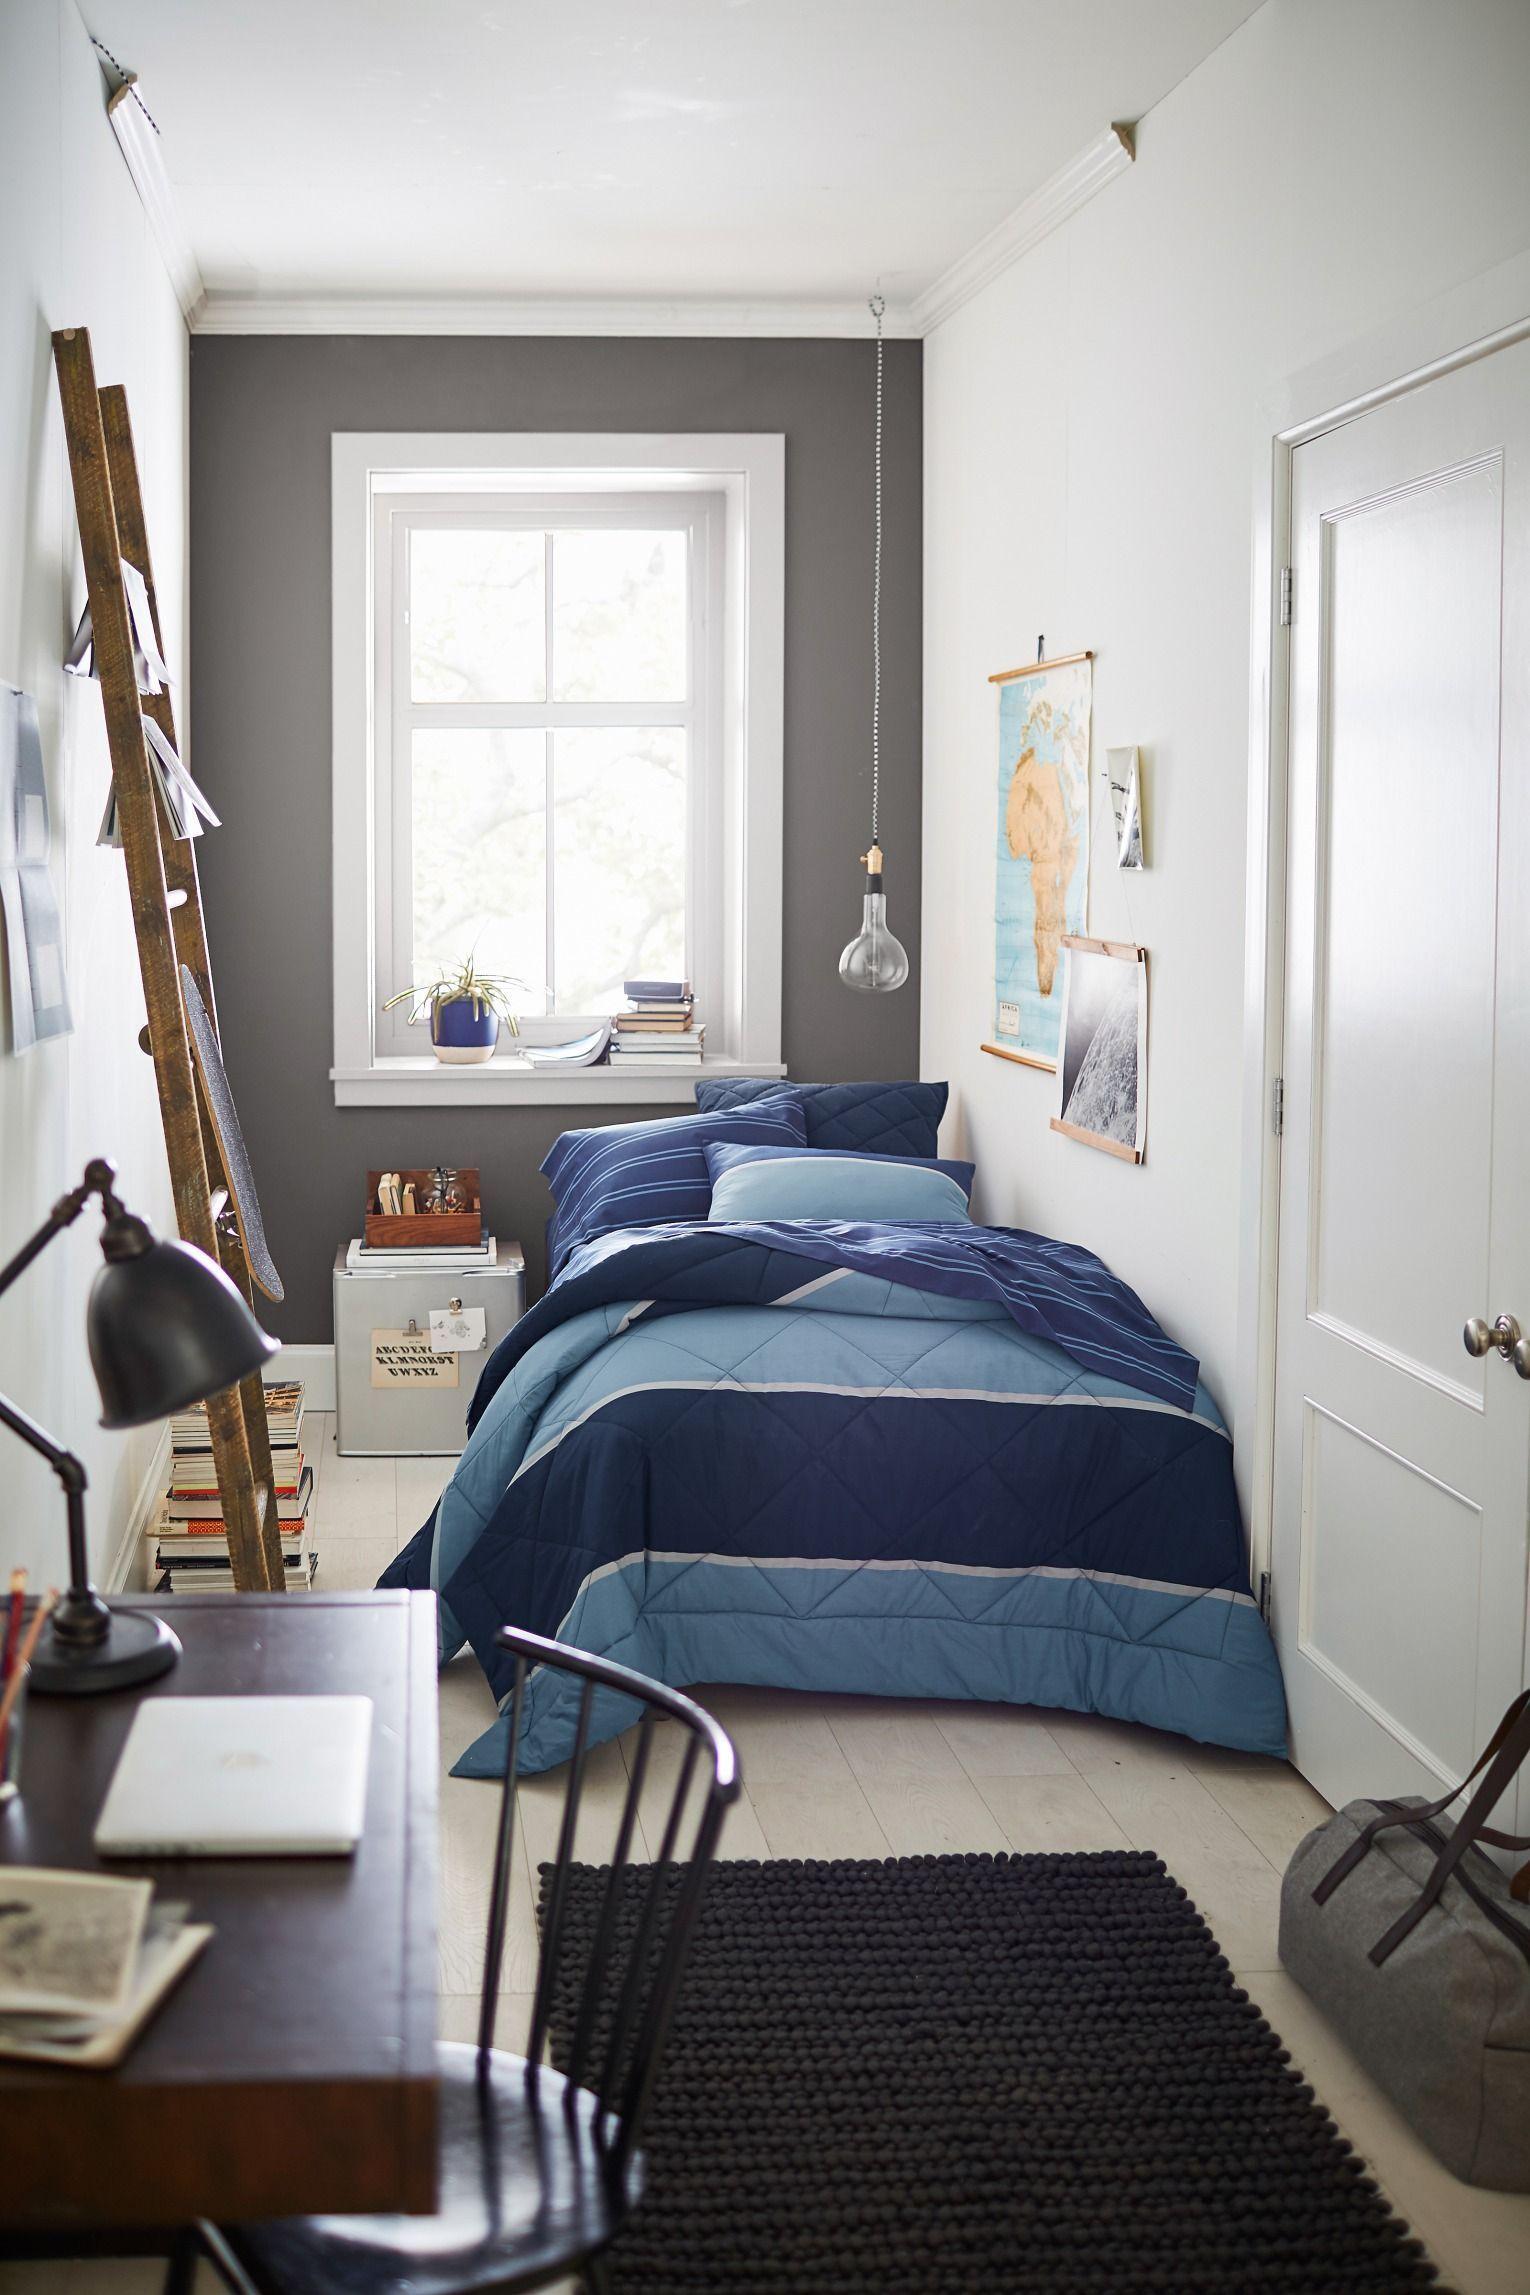 Best Amazing Bedroom Design Ideas Simple Modern Minimalist 640 x 480